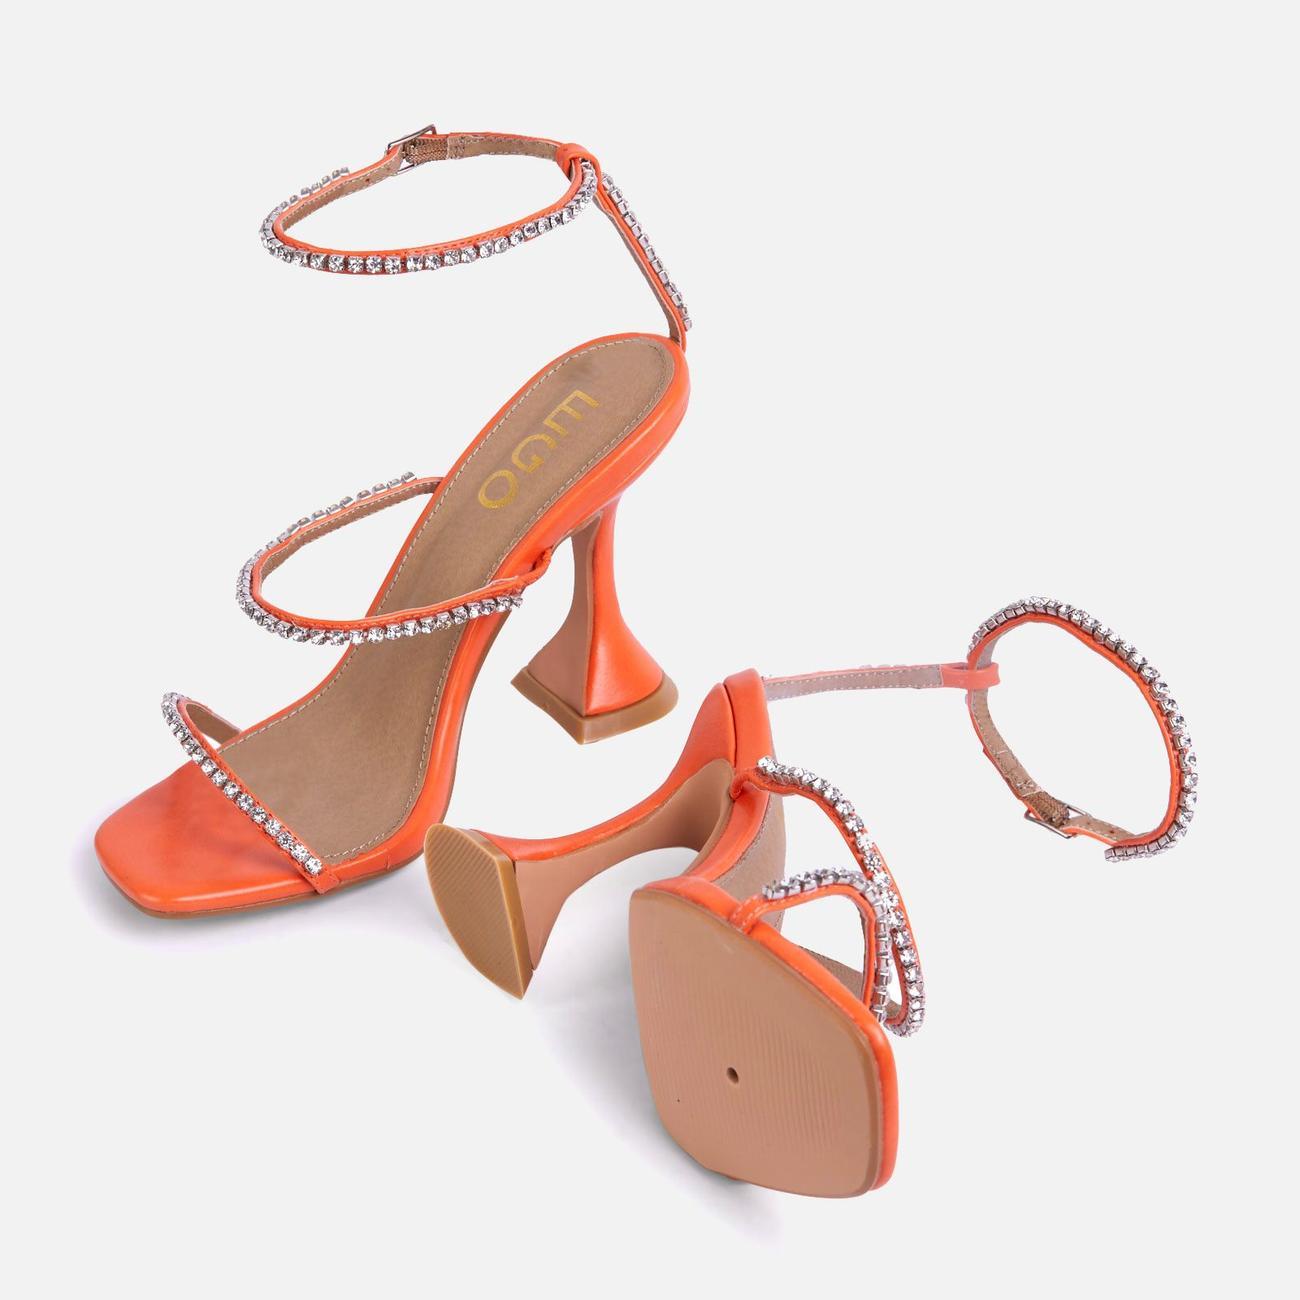 Catch Me Diamante Detail Square Toe Pyramid Heel In Orange Faux Leather Image 4